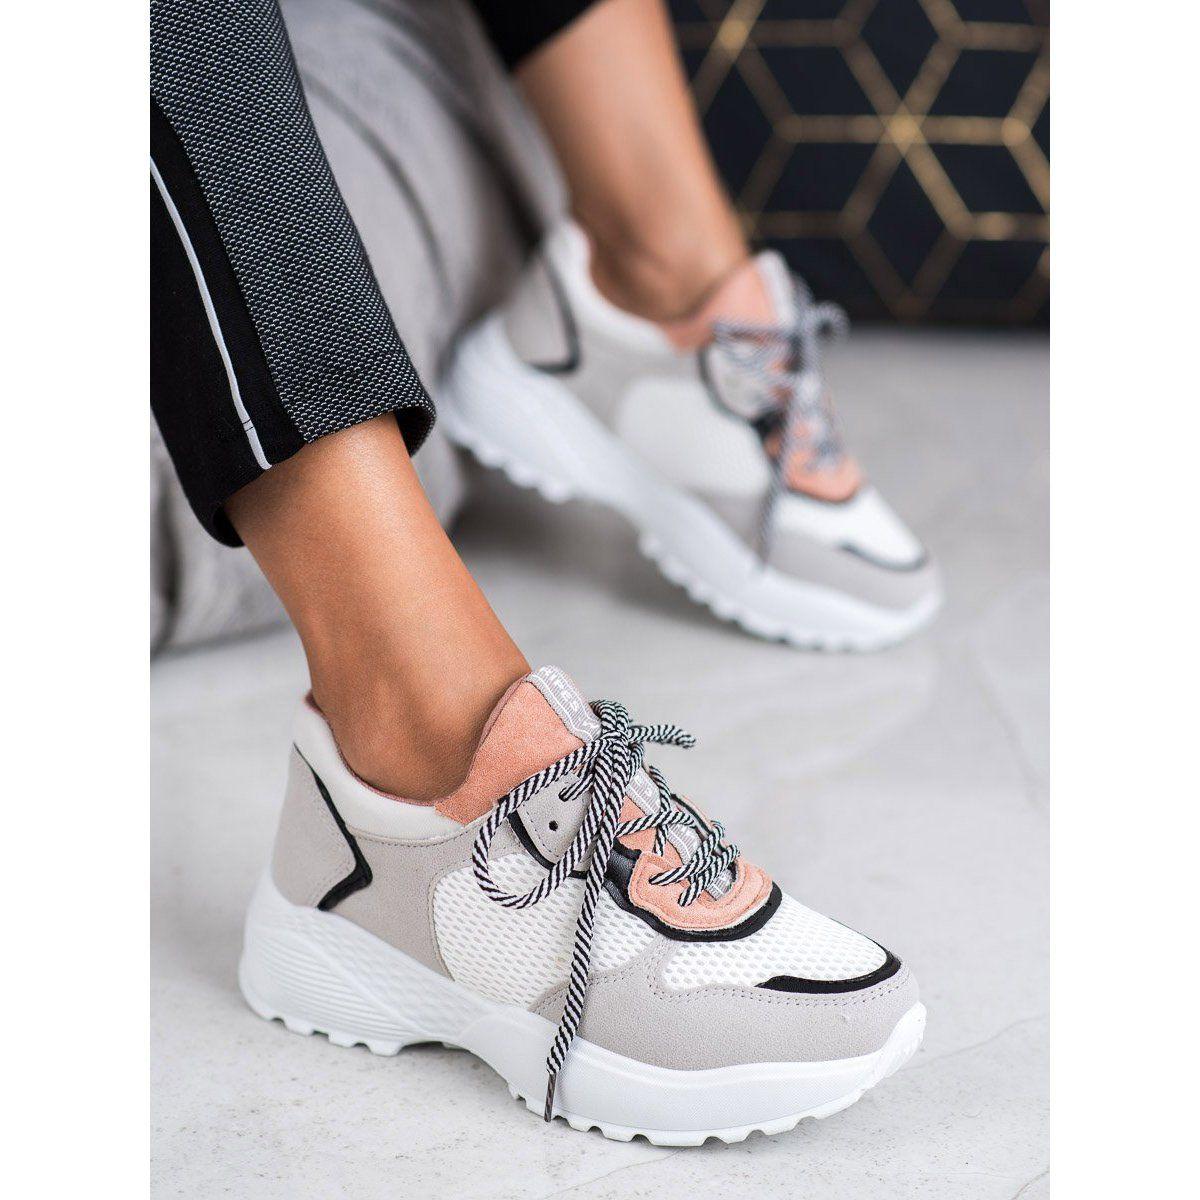 Shelovet Modne Sneakersy Rozowe Szare Air Max Sneakers Sneakers Nike Nike Air Max